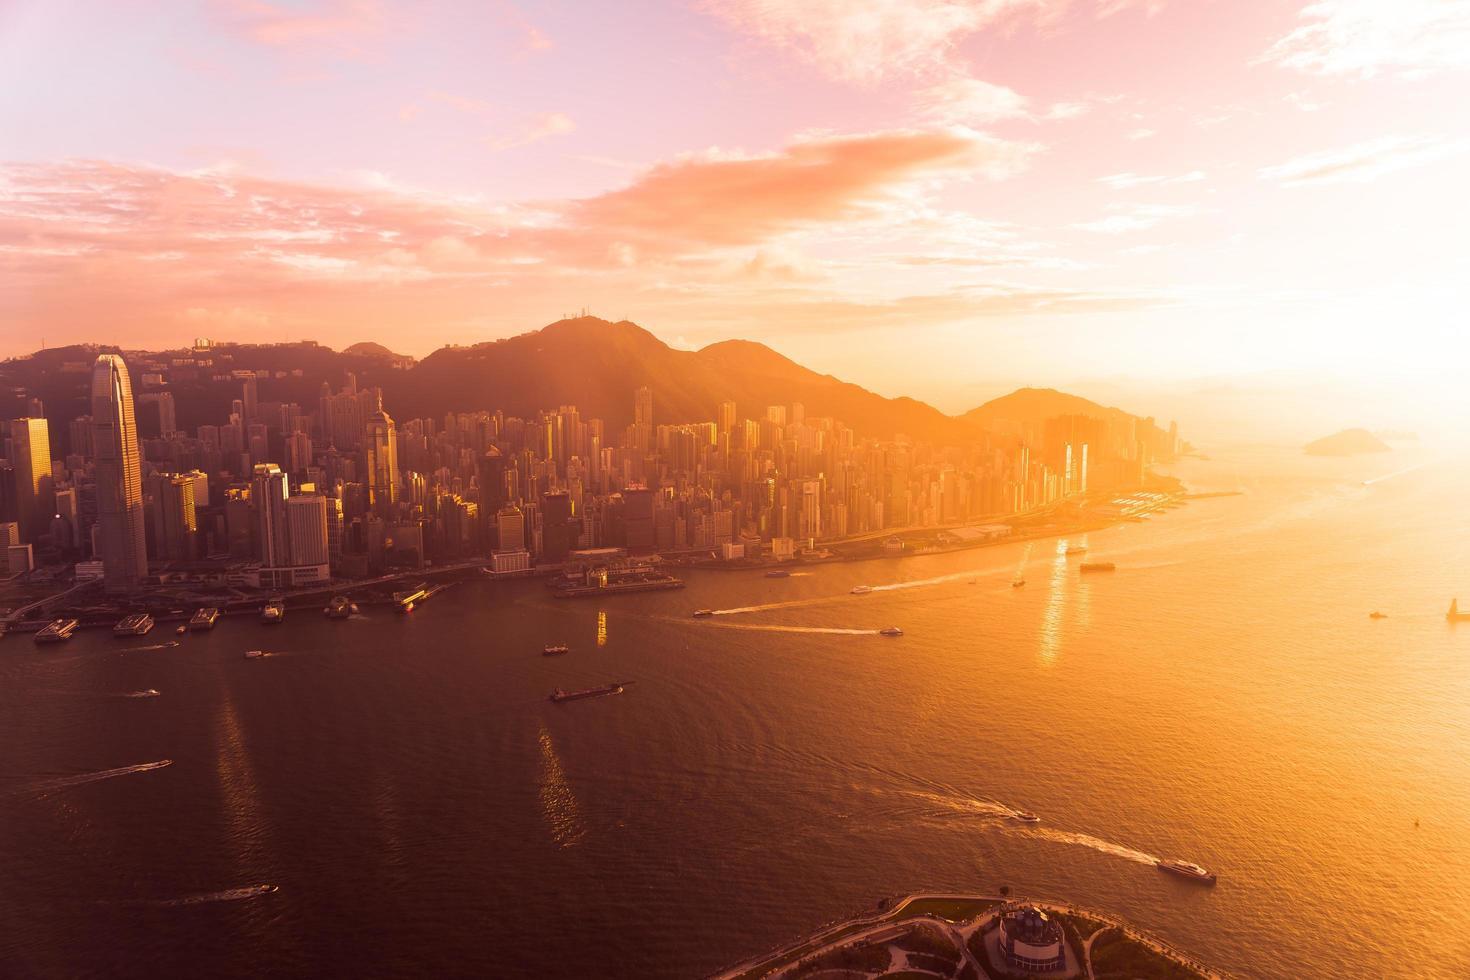 schöner bunter Sonnenuntergang über Hong Kong, China foto